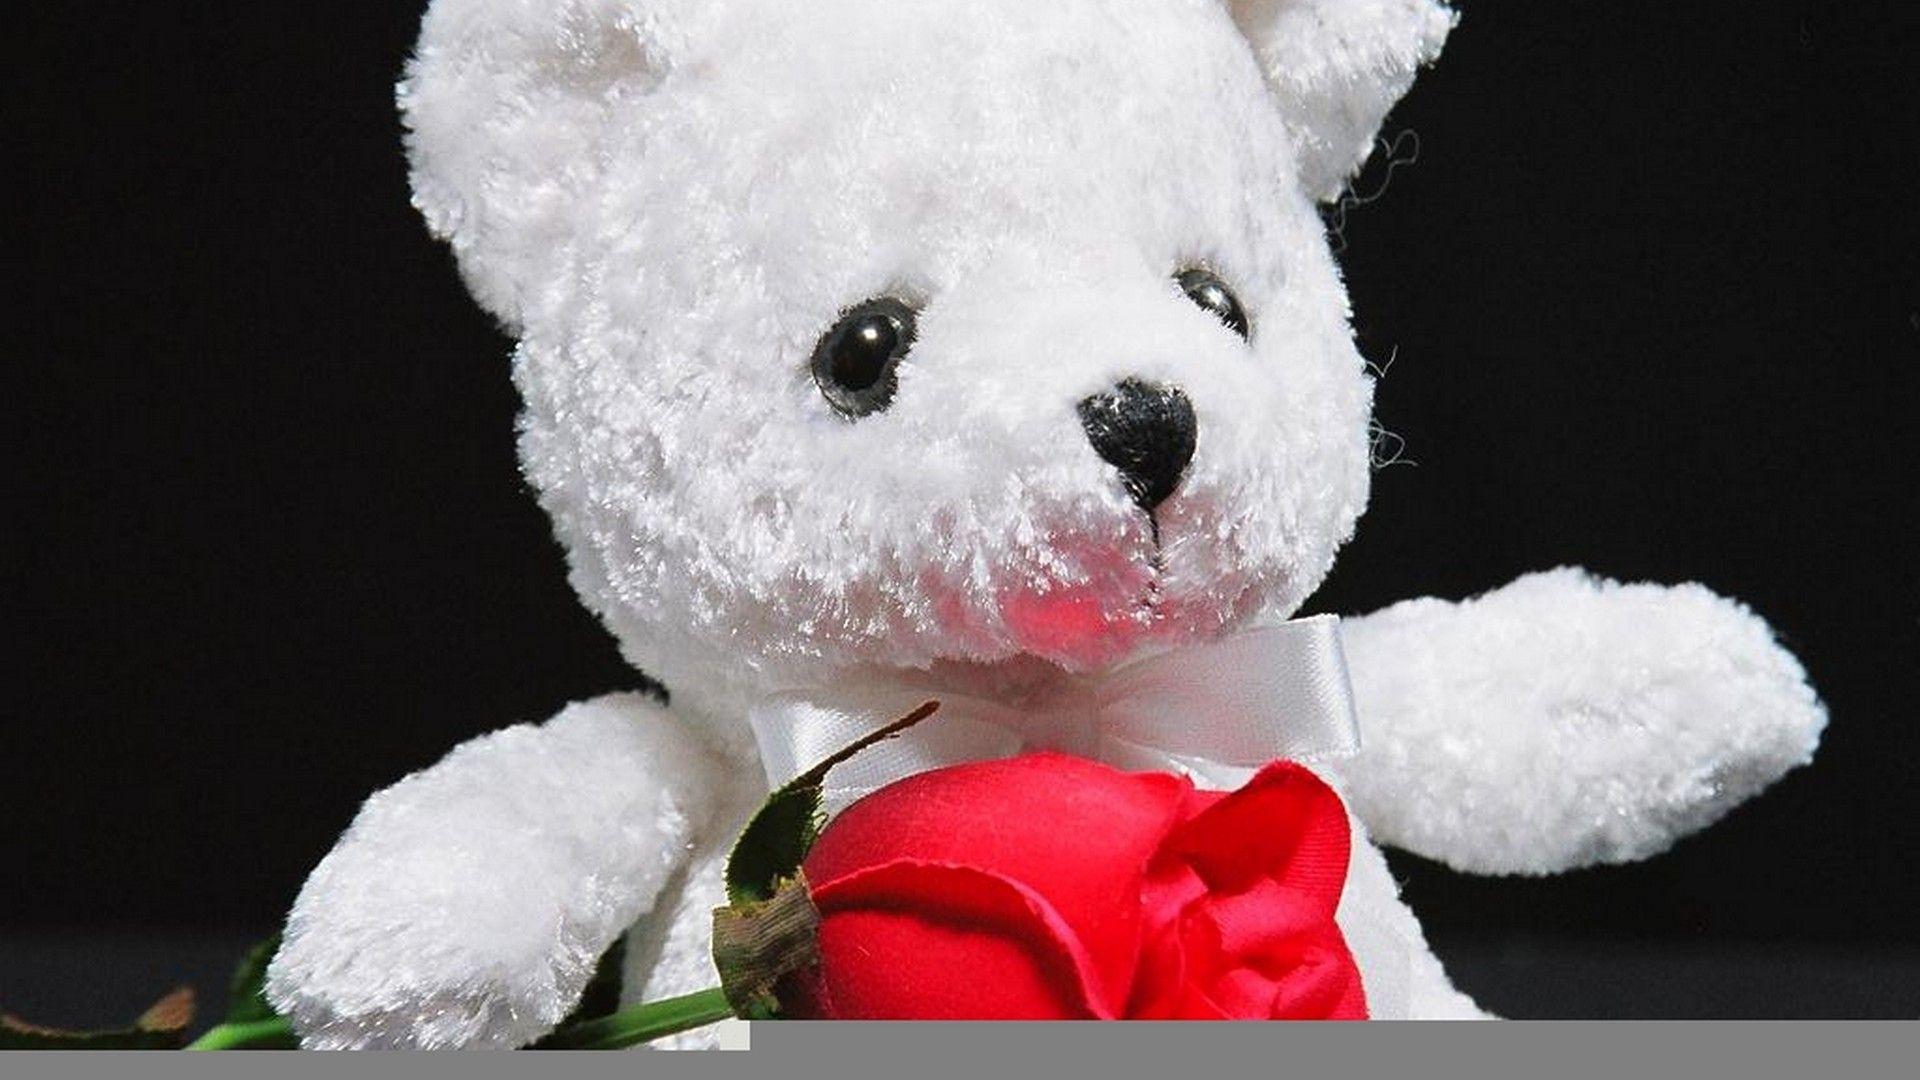 Big Teddy Bear Wallpaper For Desktop Best Wallpaper Hd Teddy Bear Wallpaper Teddy Bear Pictures Bear Valentines